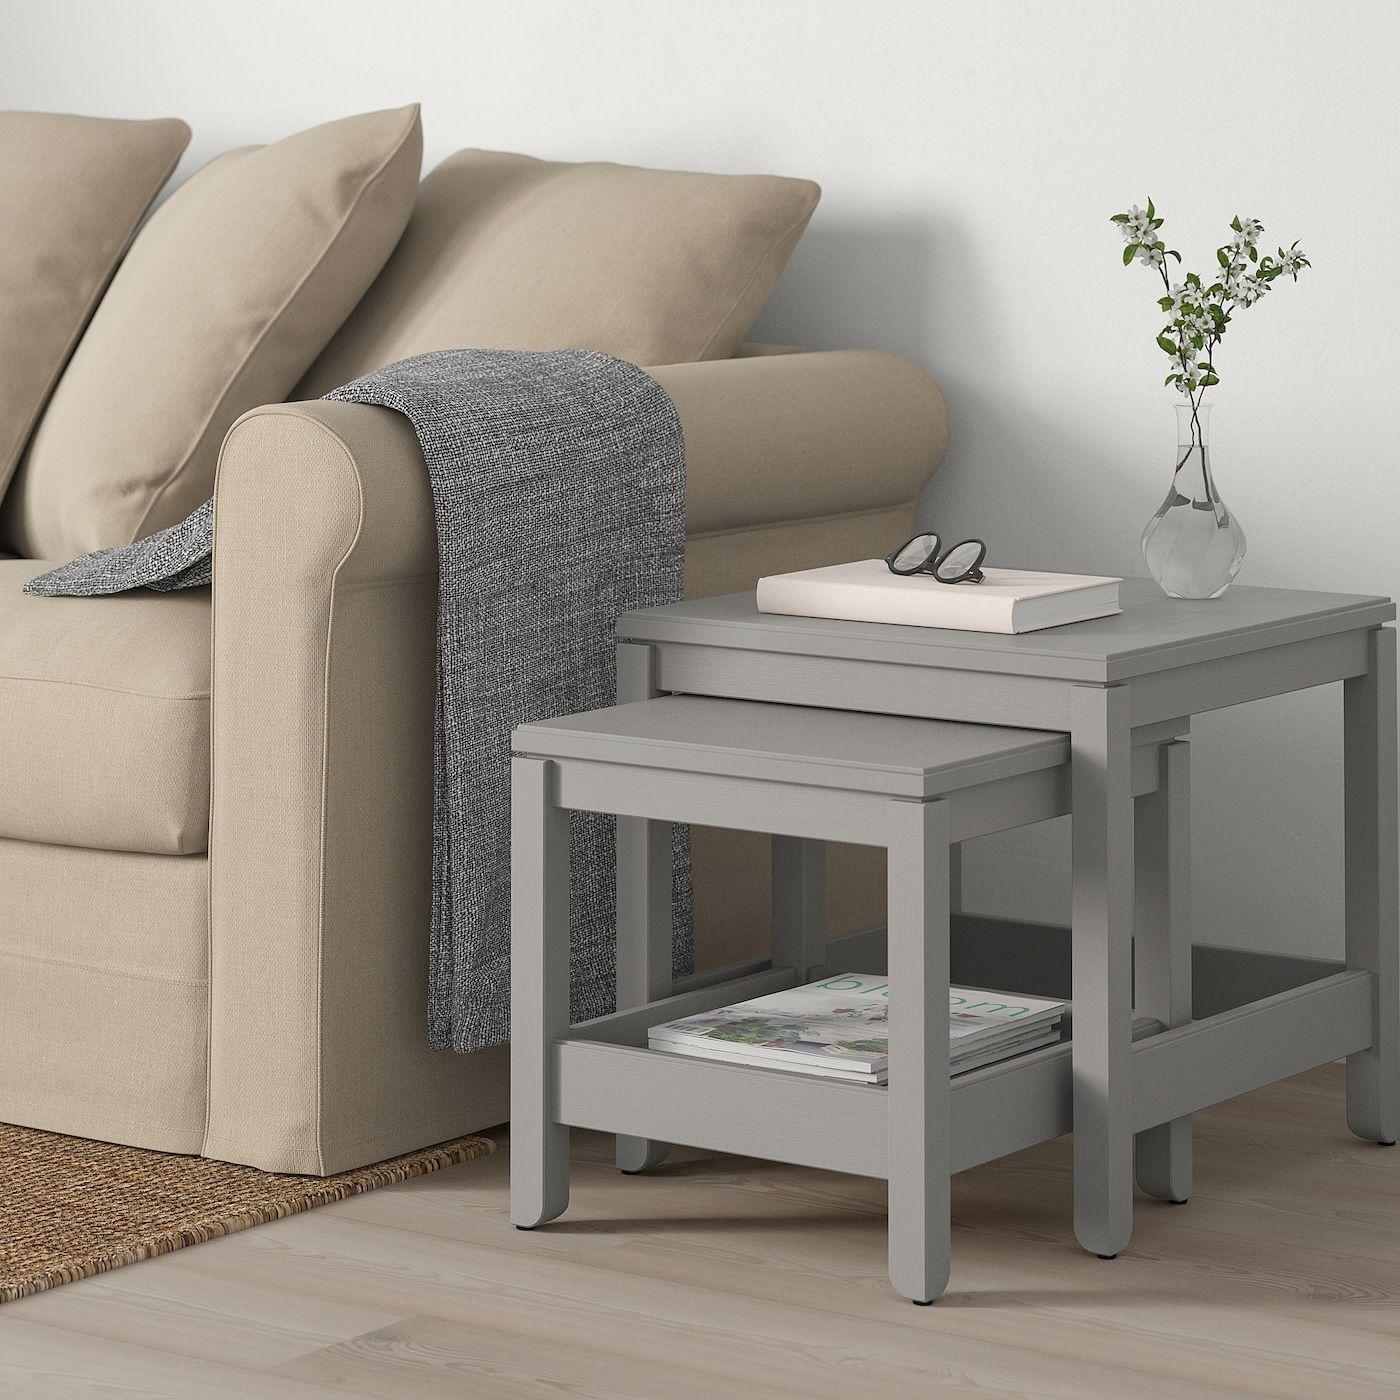 Havsta Satztische 2 St Grau Ikea Deutschland In 2020 Nesting Tables Nesting Tables Living Room Ikea #nesting #tables #living #room